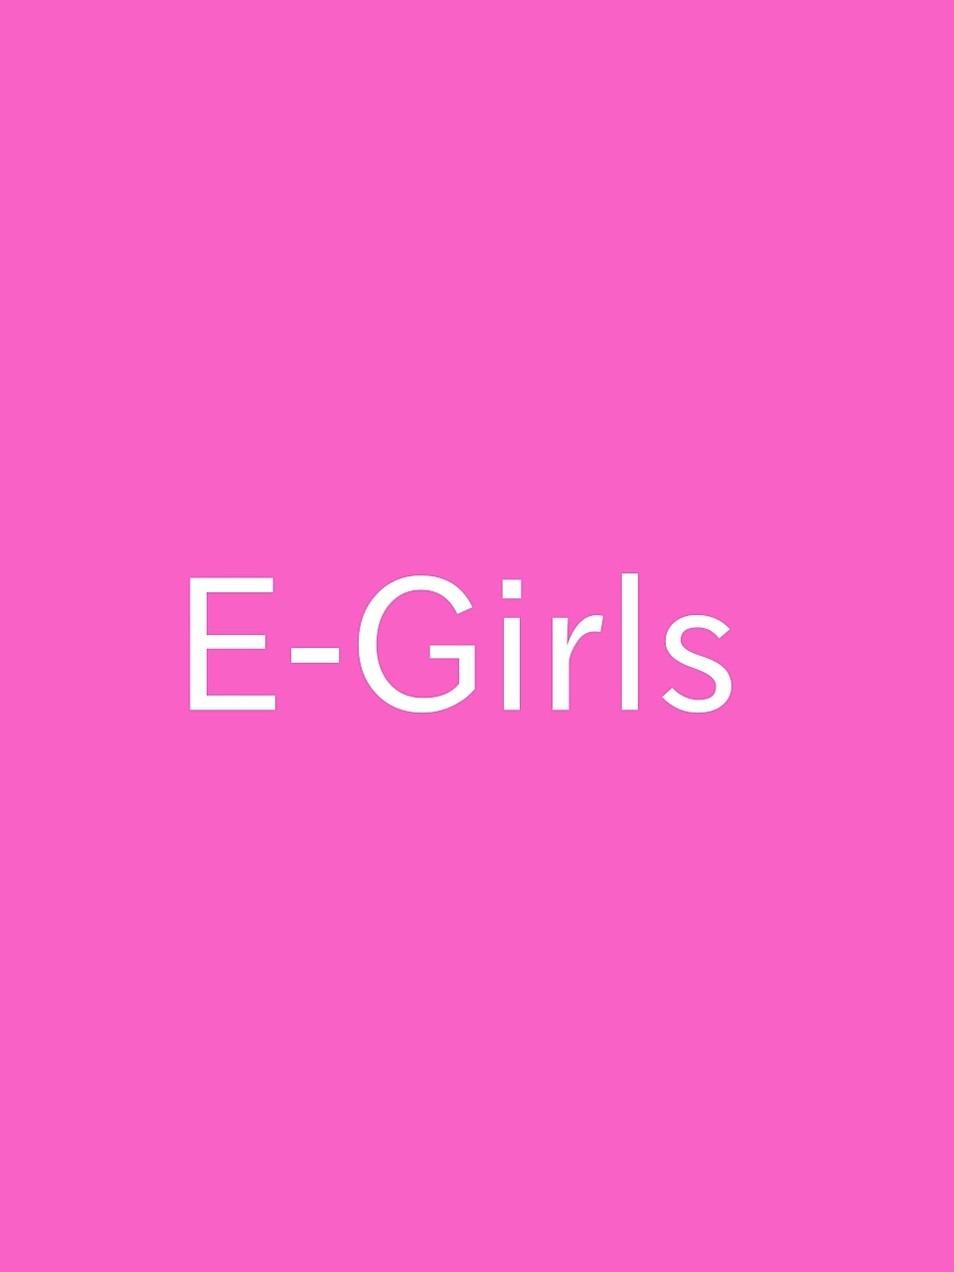 E Girls 壁紙 58817412 完全無料画像検索のプリ画像 Bygmo